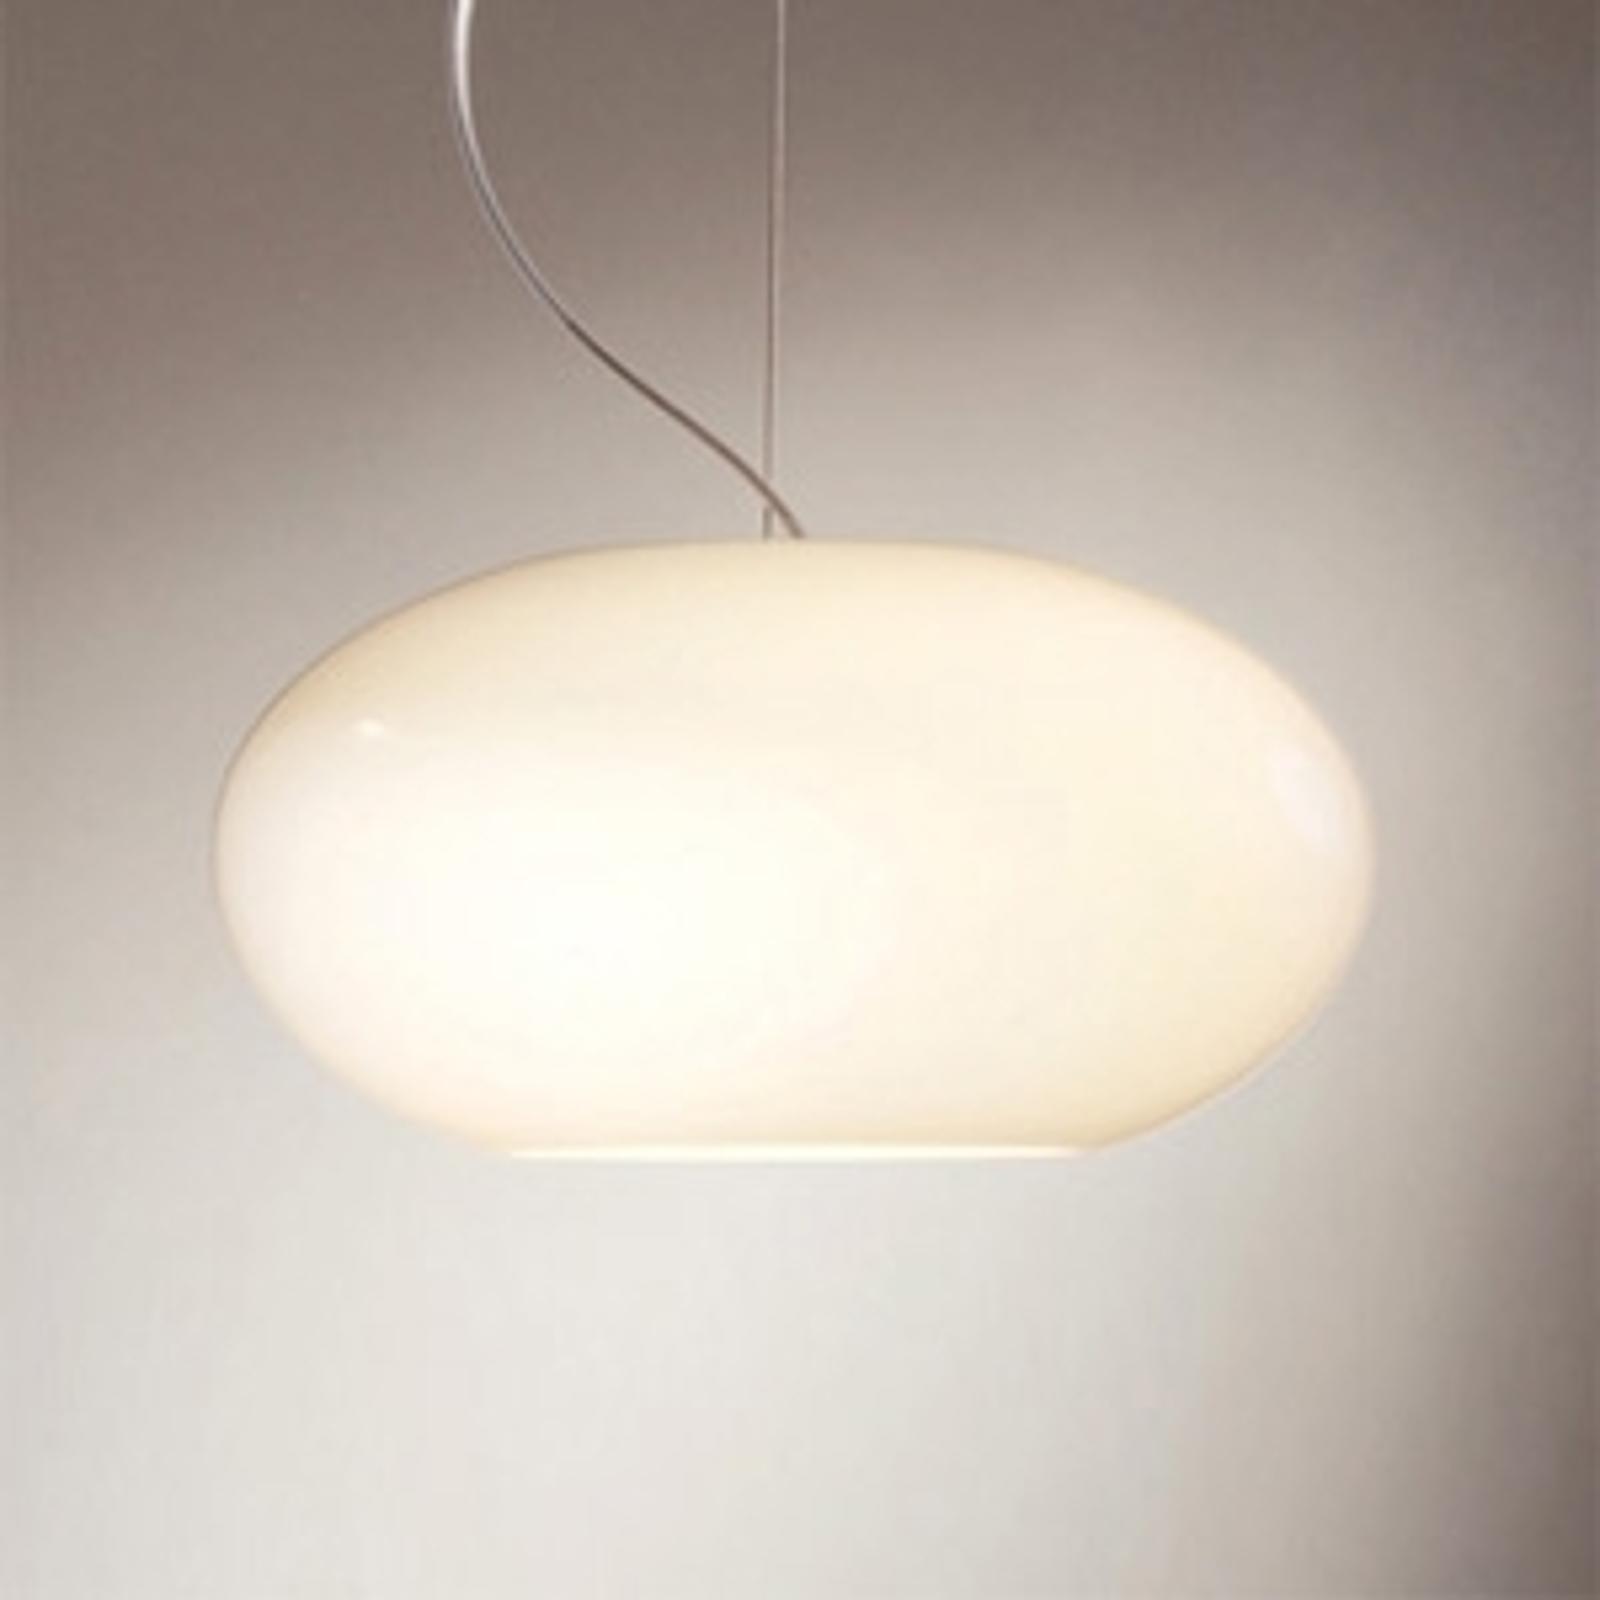 AIH, strakke hanglamp, 28 cm, crème glanzend